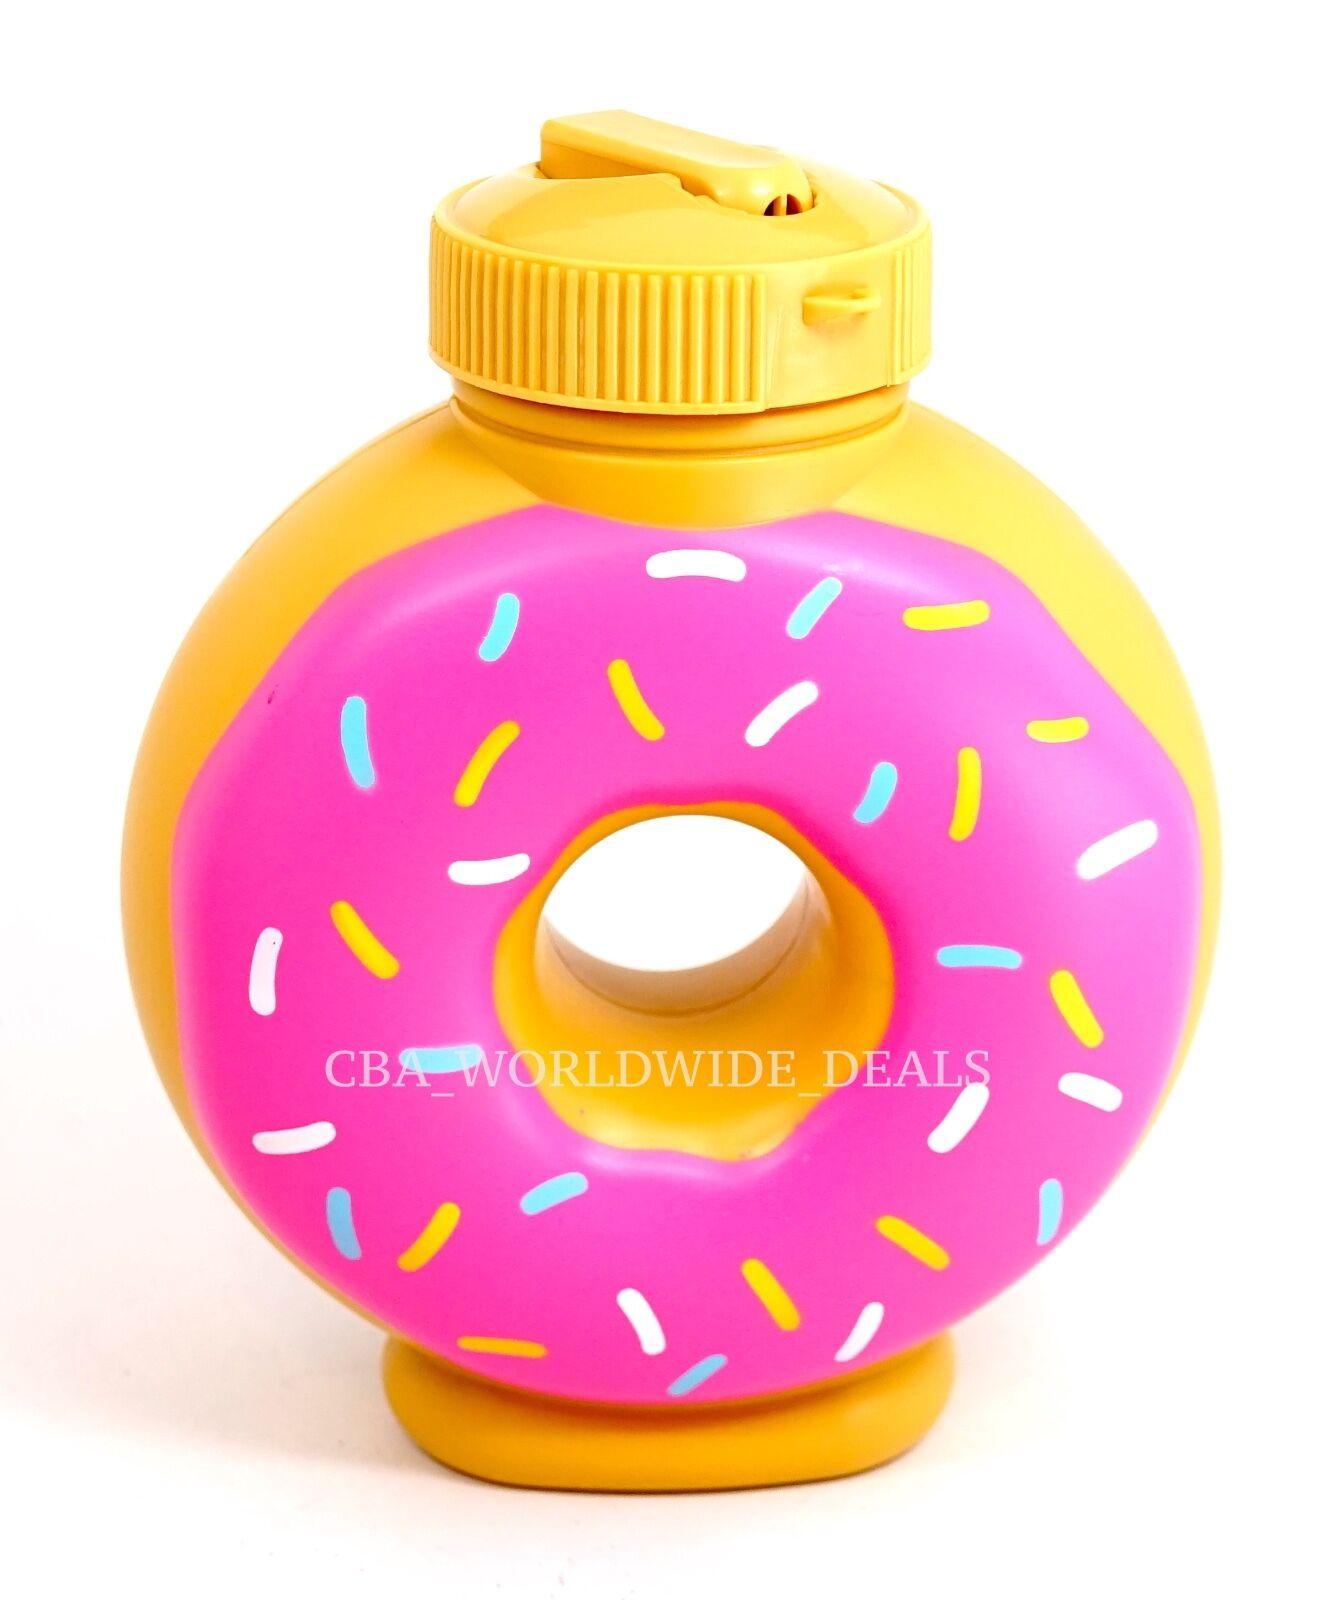 NEW Universal Studios Simpsons Lard Lad Donuts Pink Souvenir Sipper Drink Cup